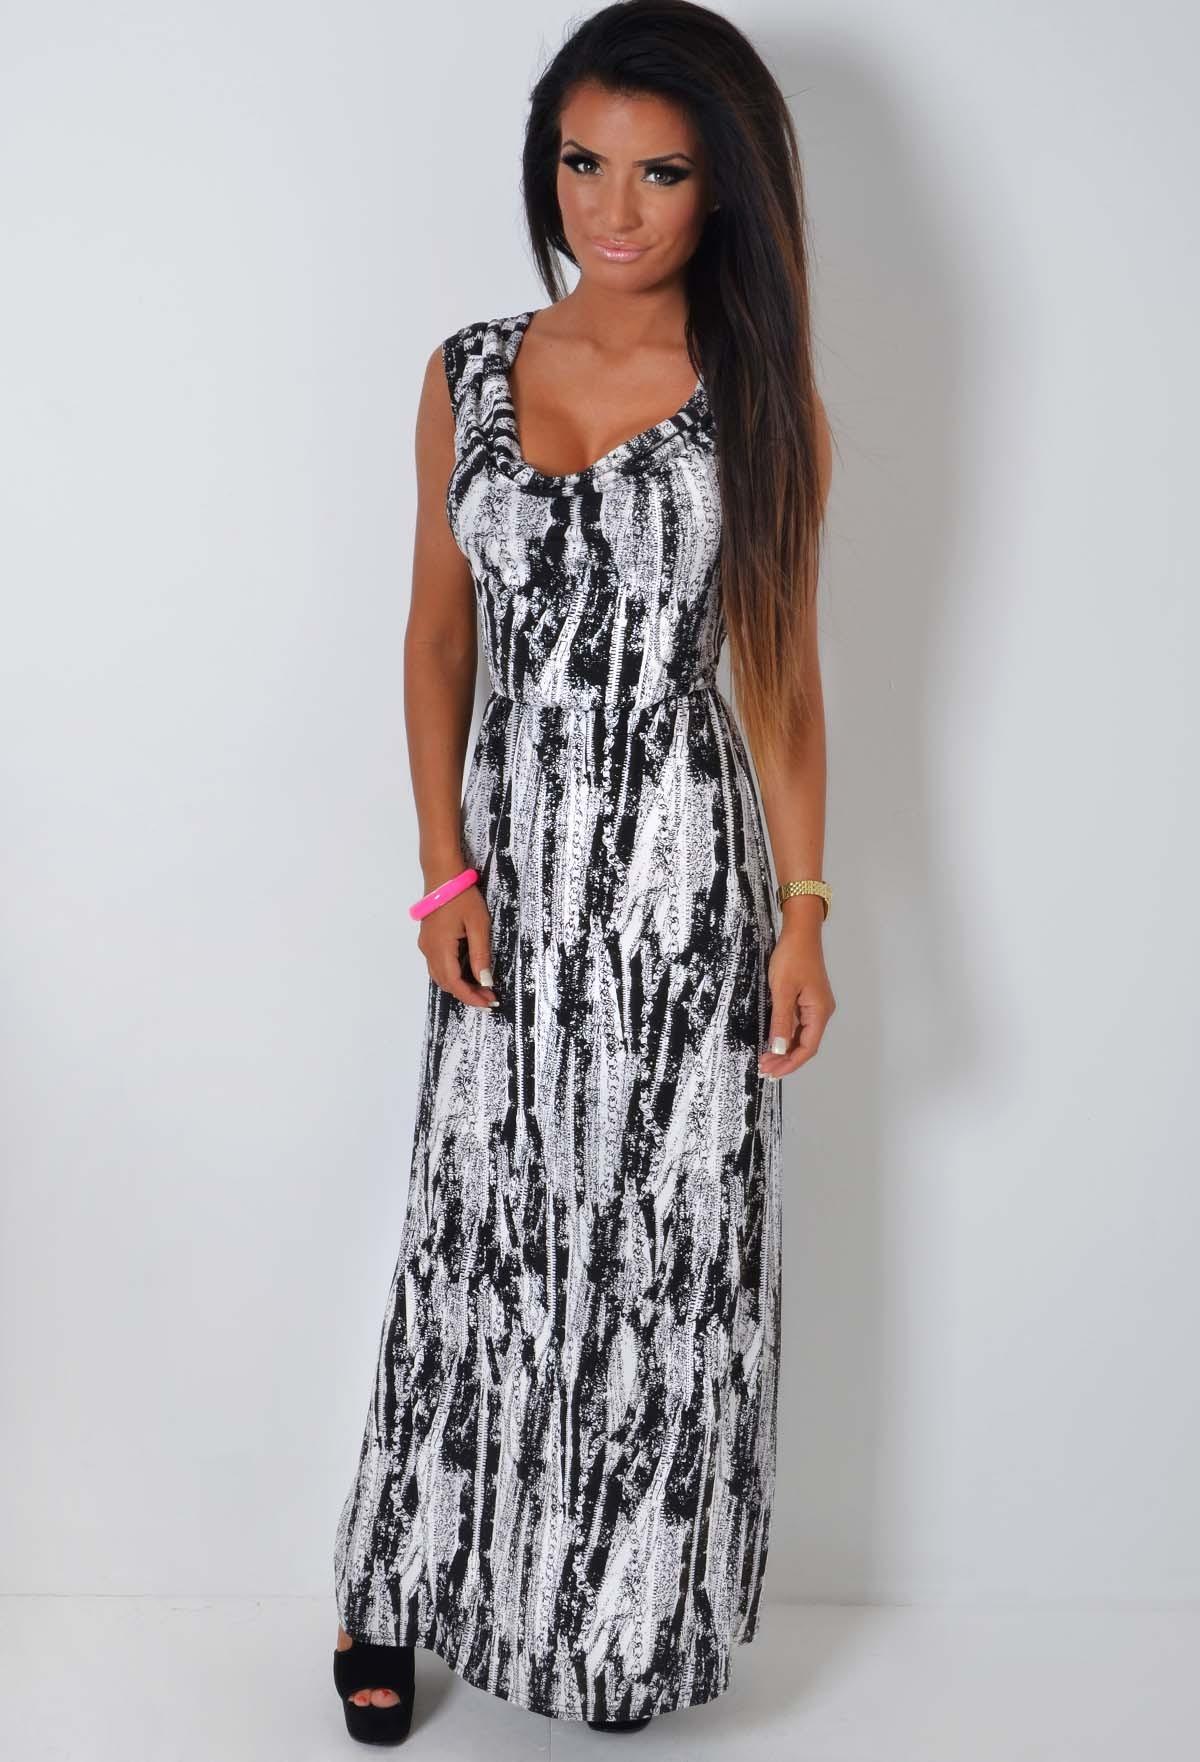 Pasini Black and White Draped Neck Maxi Dress | Pink Boutique